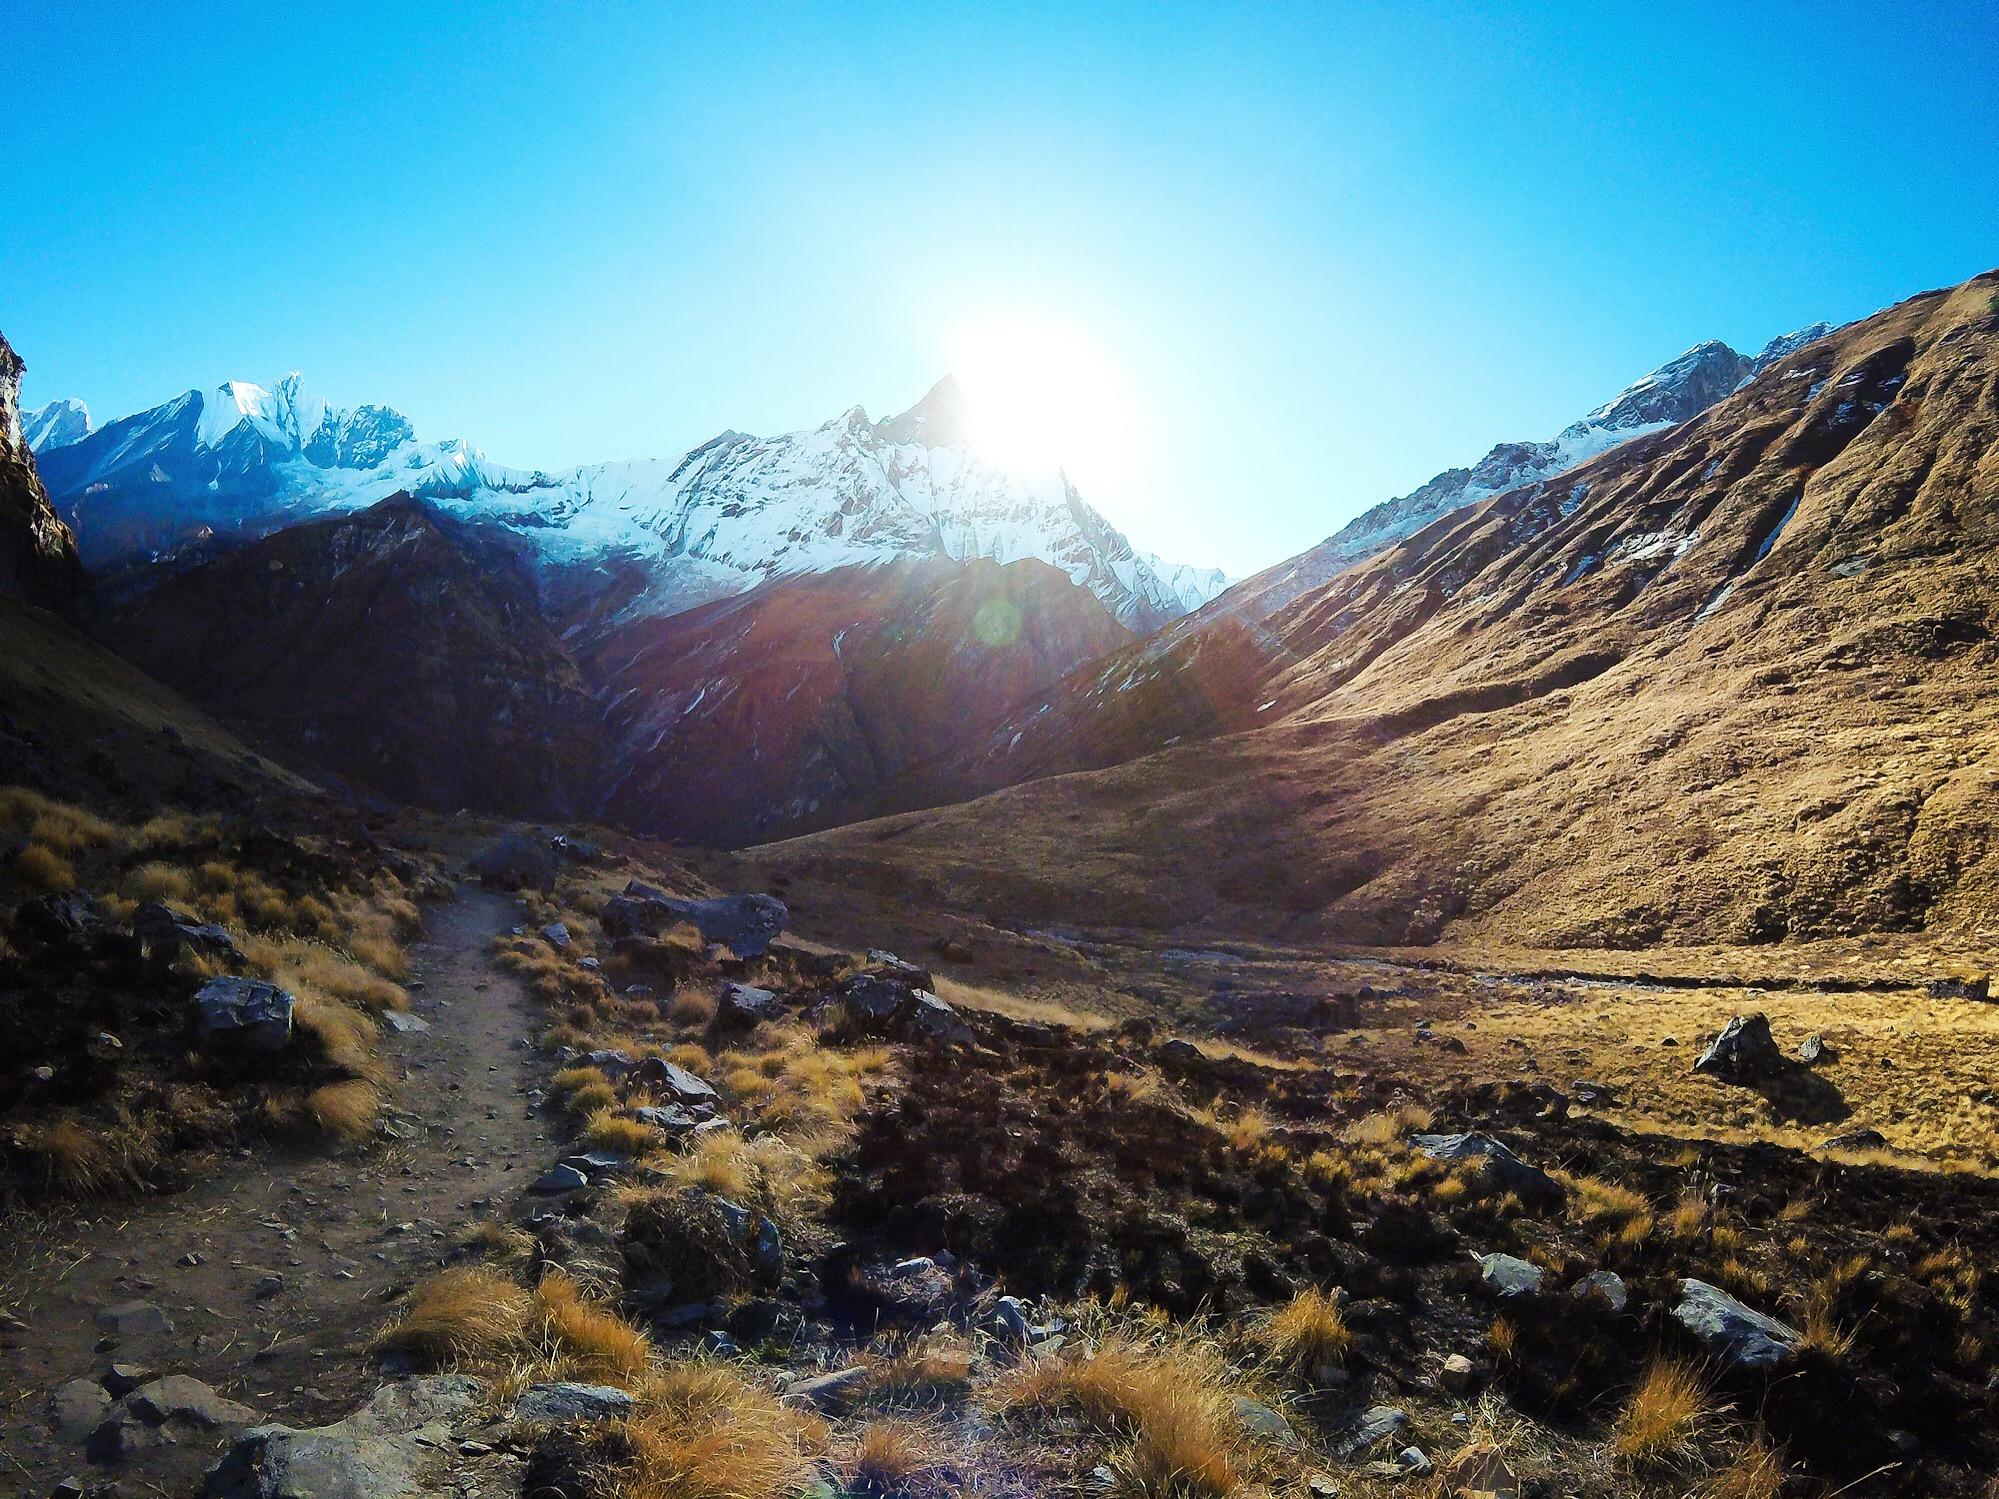 Nov 13.2, 2016   For a kilometer we enjoy a meadow trail along the Modi Khola River, the major drain of the East Annapurna Glacier. Rounding Hinku Cave, the sister peaks of Gandharwa Chuli and Machhapuchhre streak a morning sun.